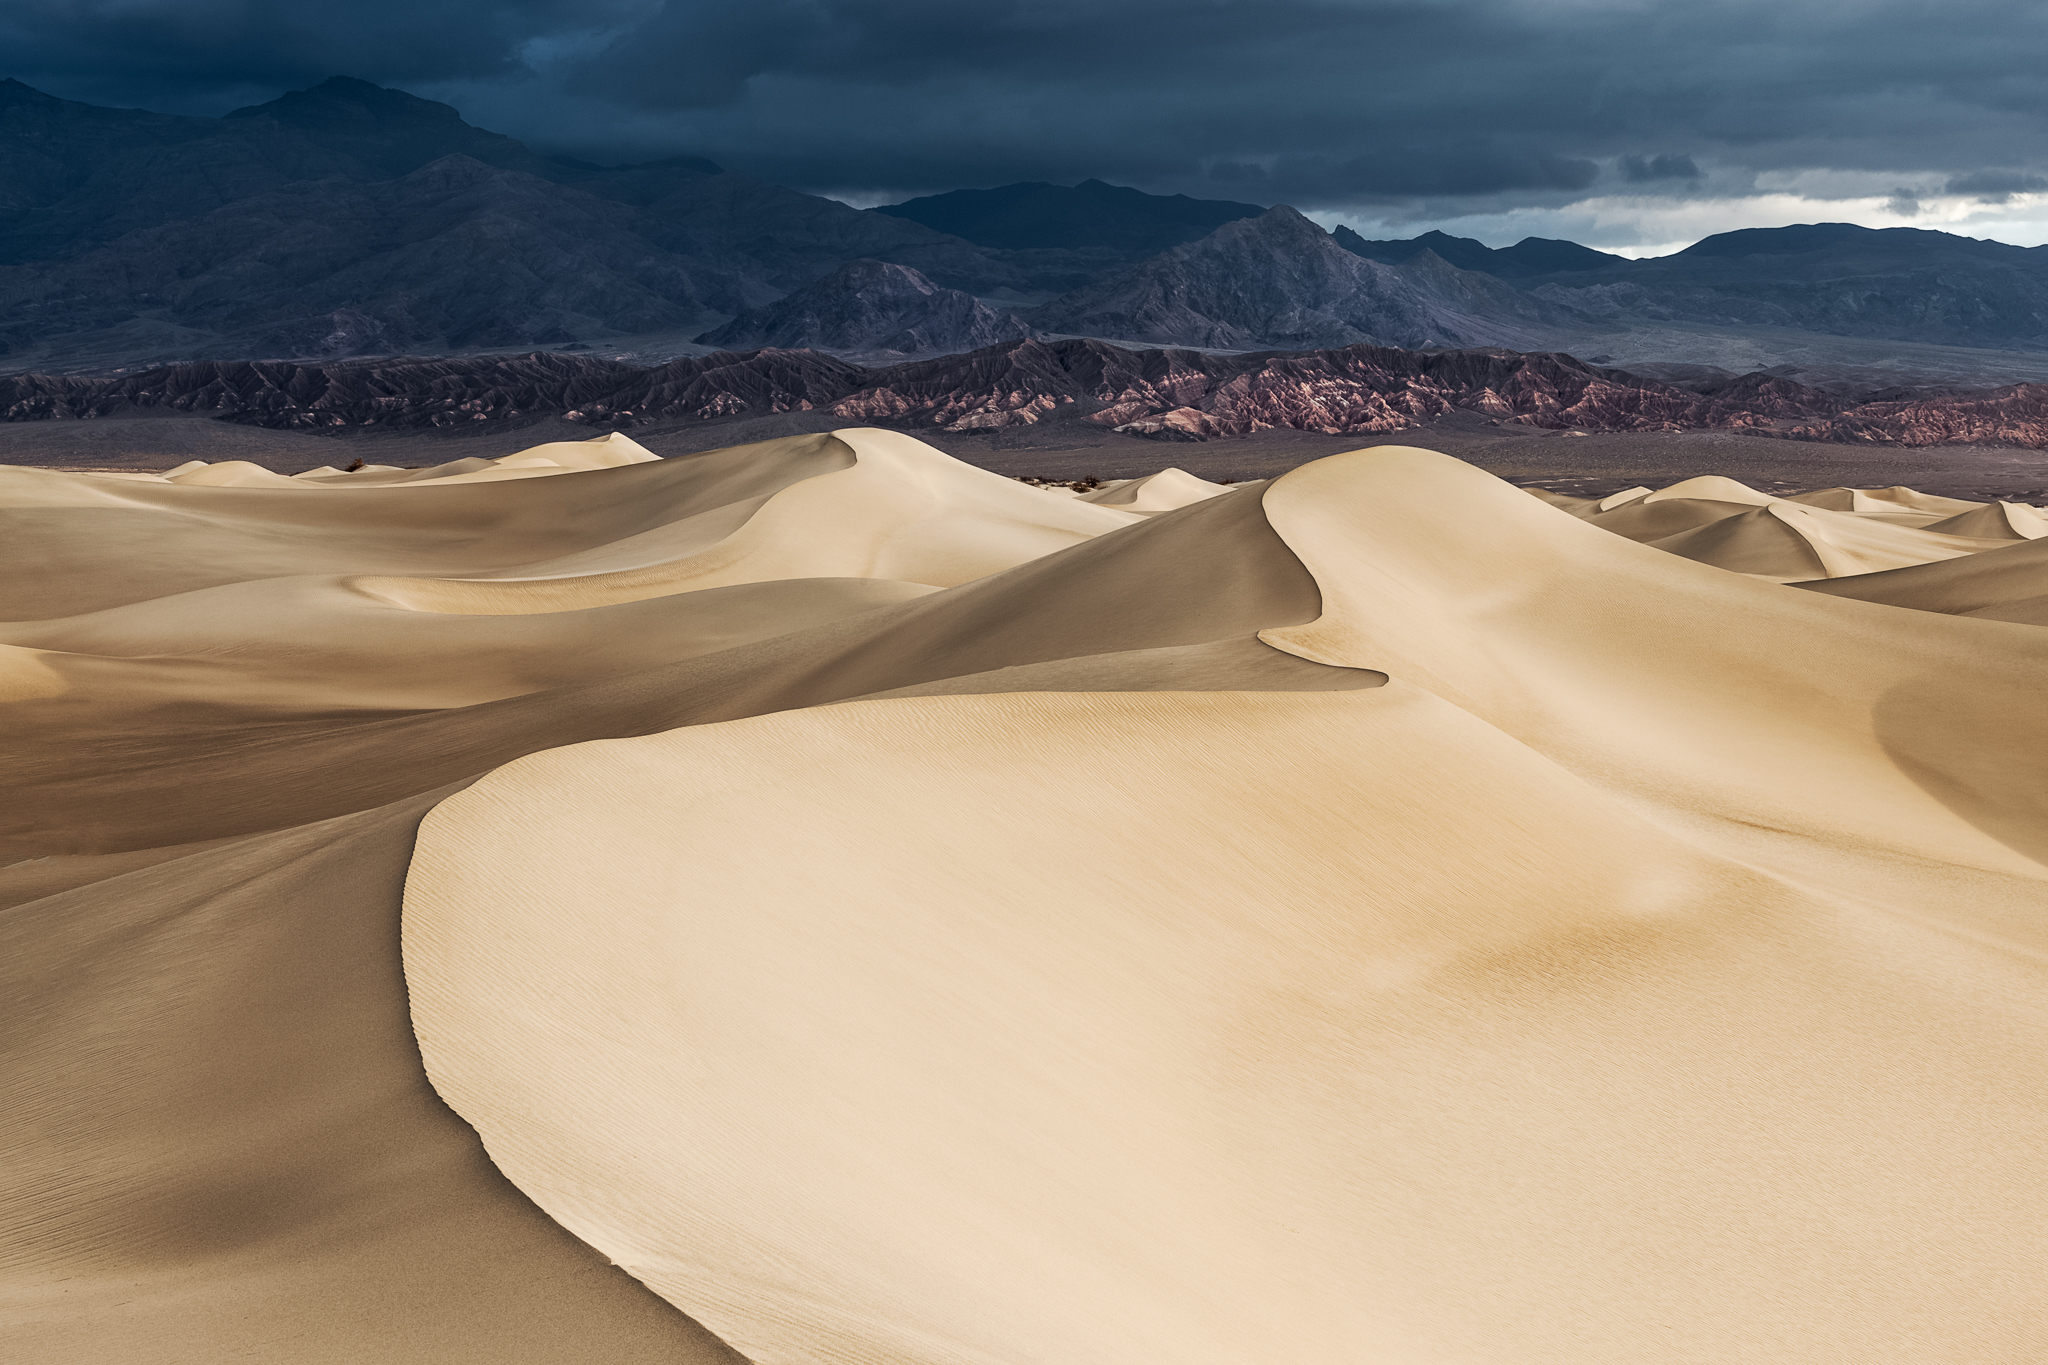 After the Storm...Mesquite Dunes Sunrise